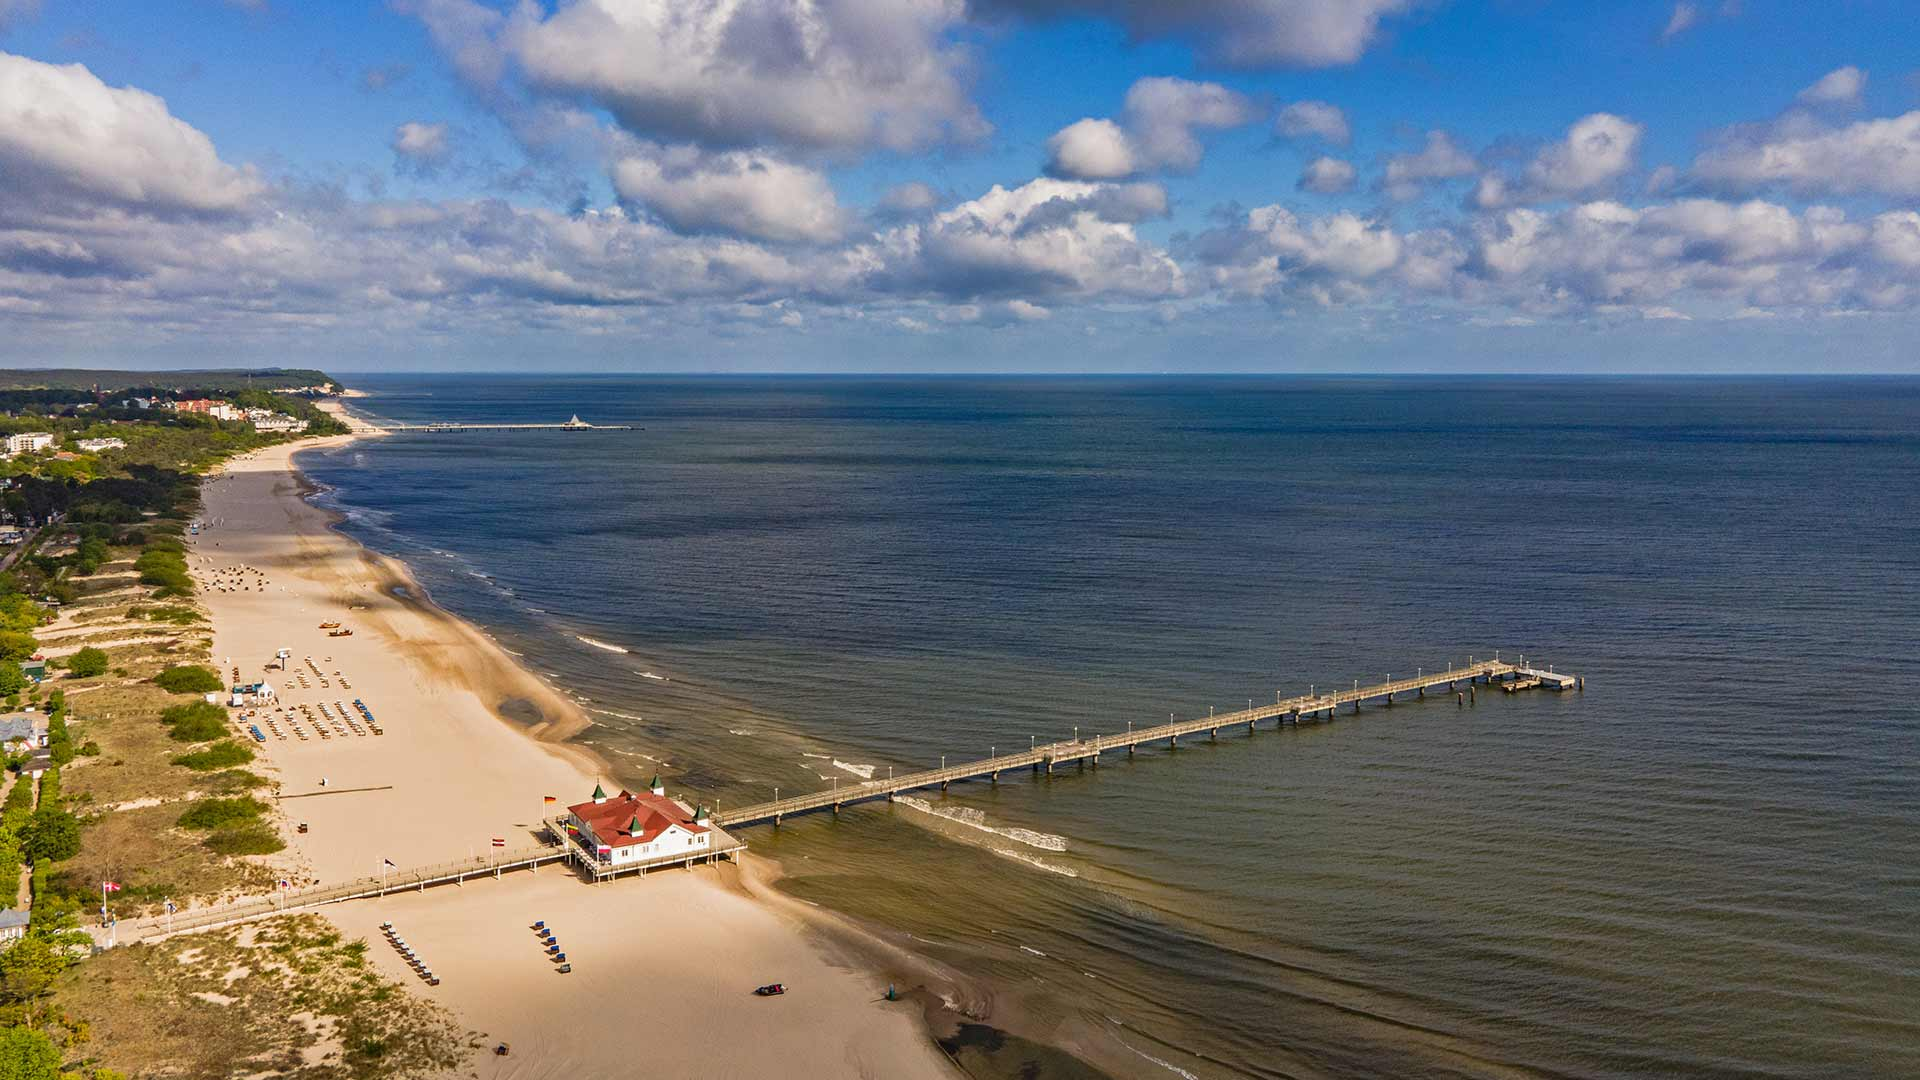 Seebrücke Ahlbeck Luftaufnahme Herrgott Strandhus